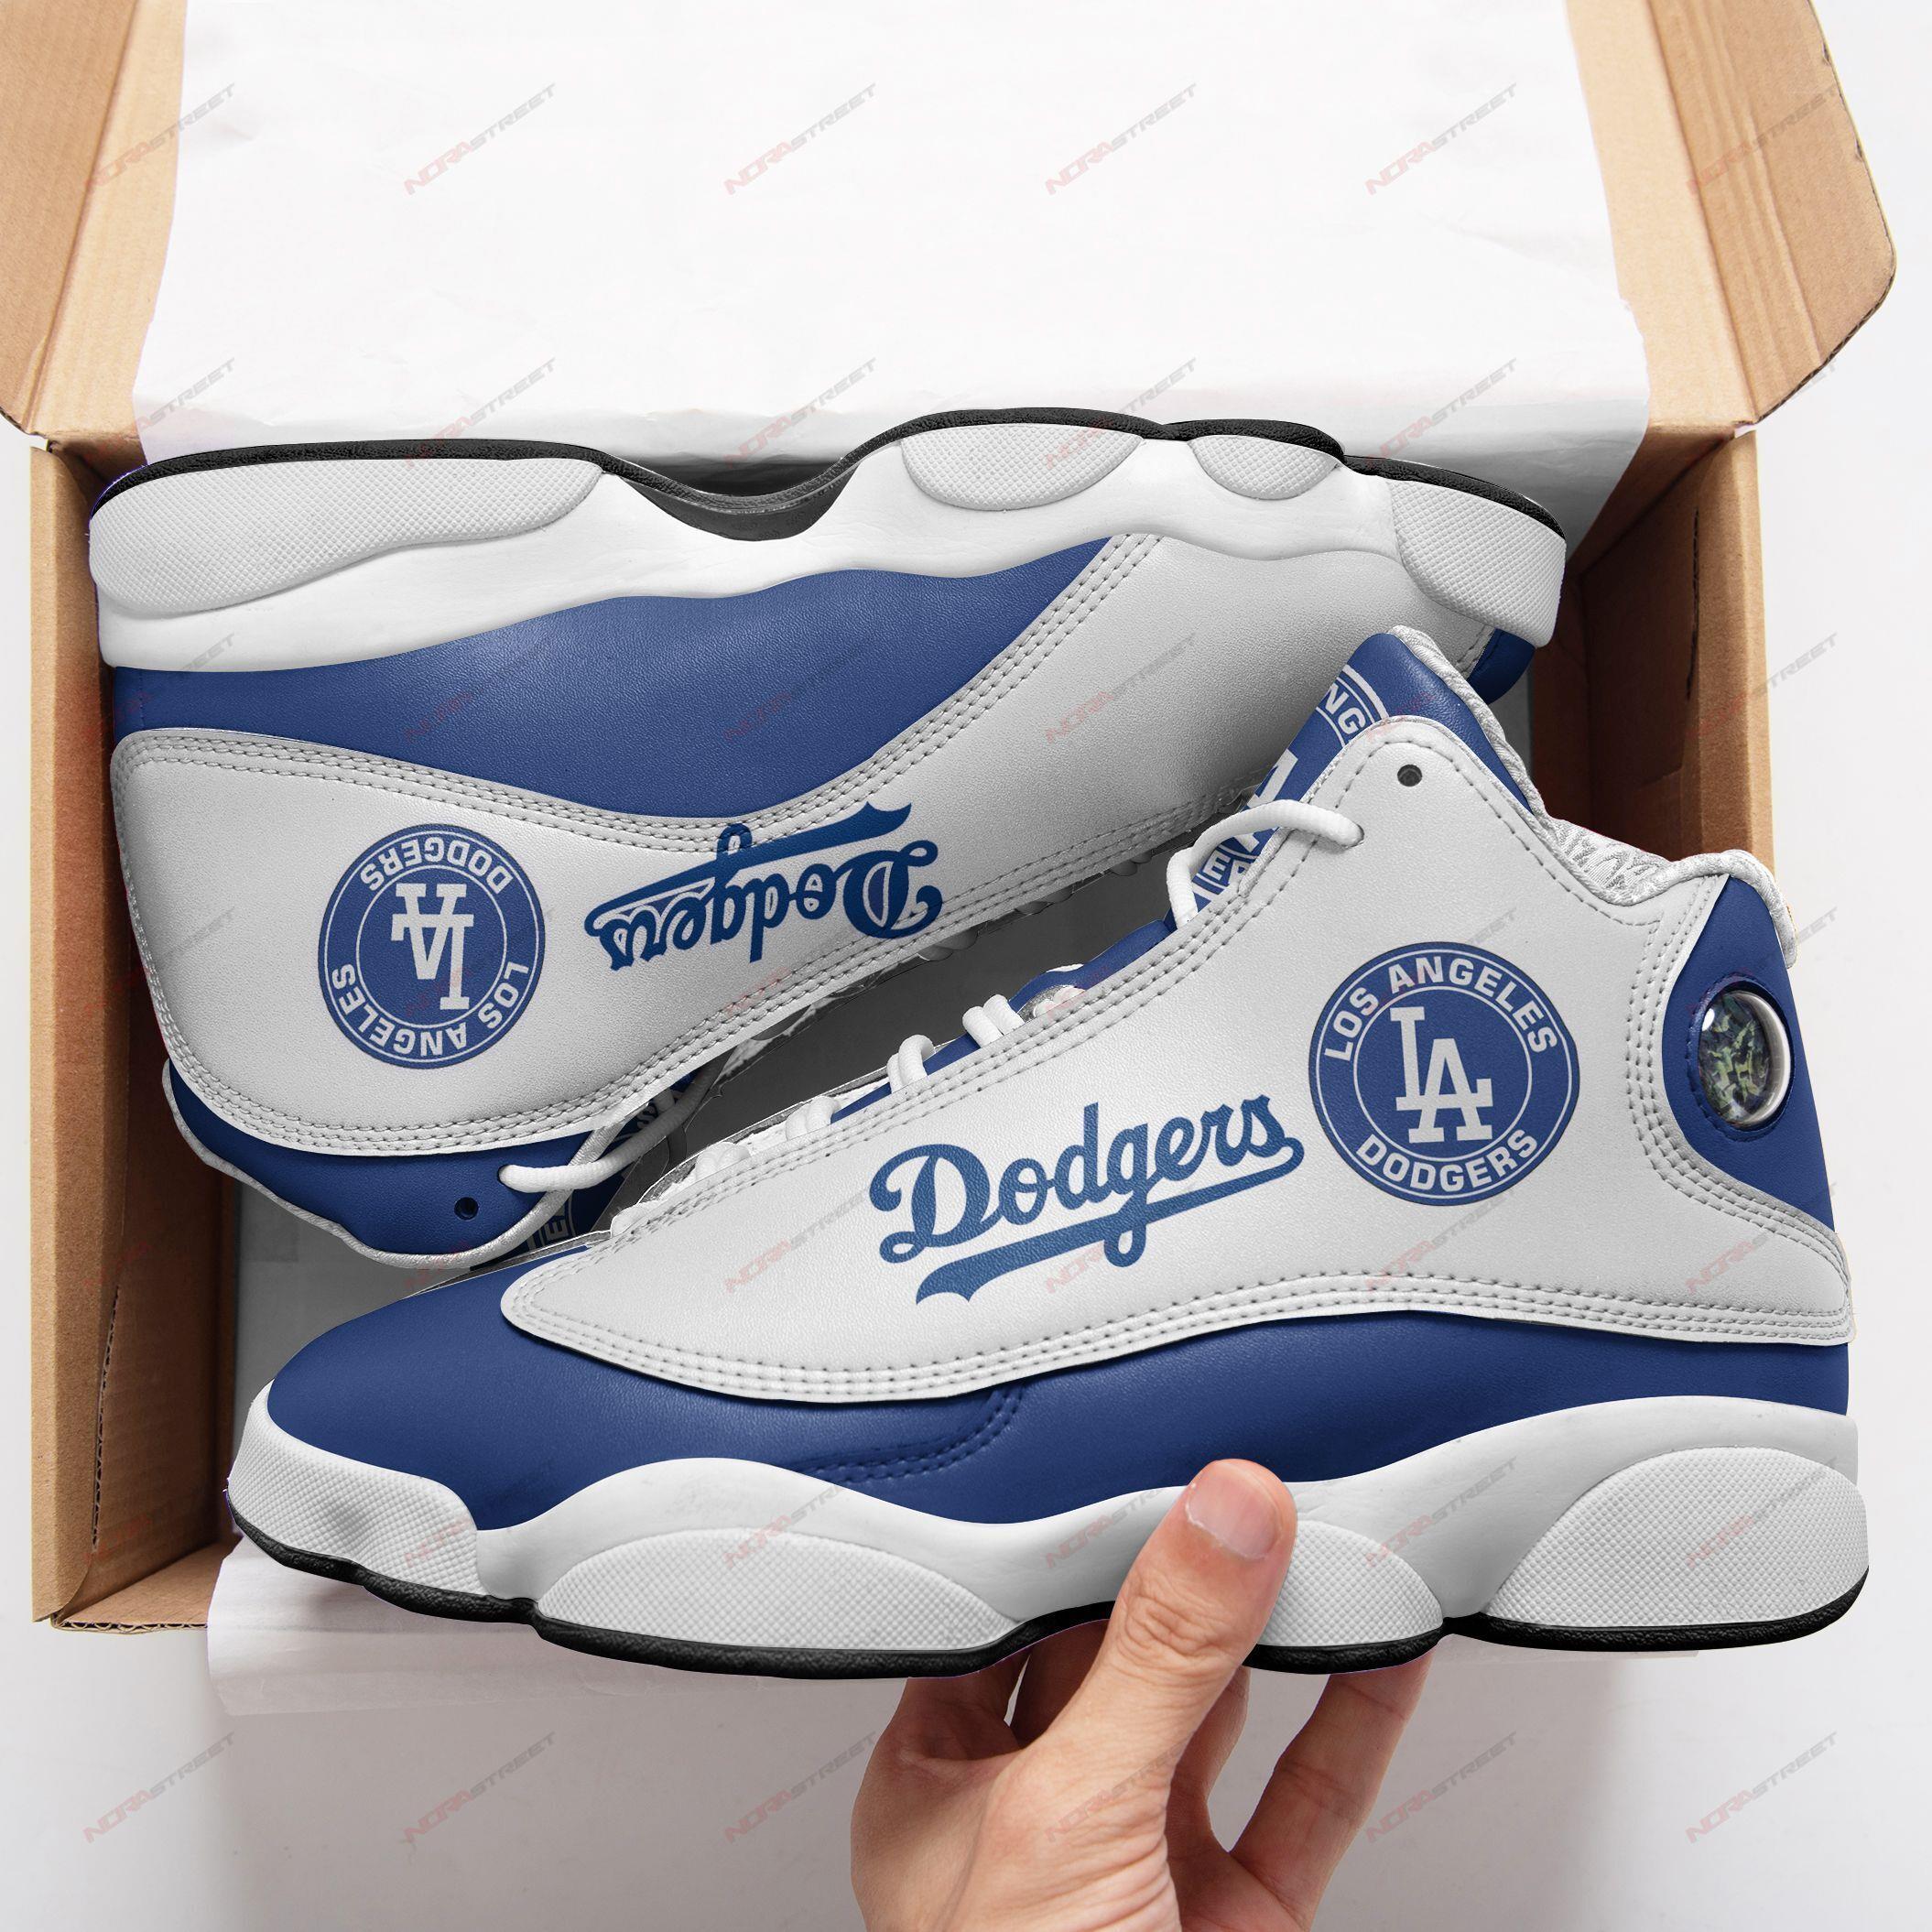 Los Angeles Dodgers Air Jordan 13 Sneakers Sport Shoes Full Size